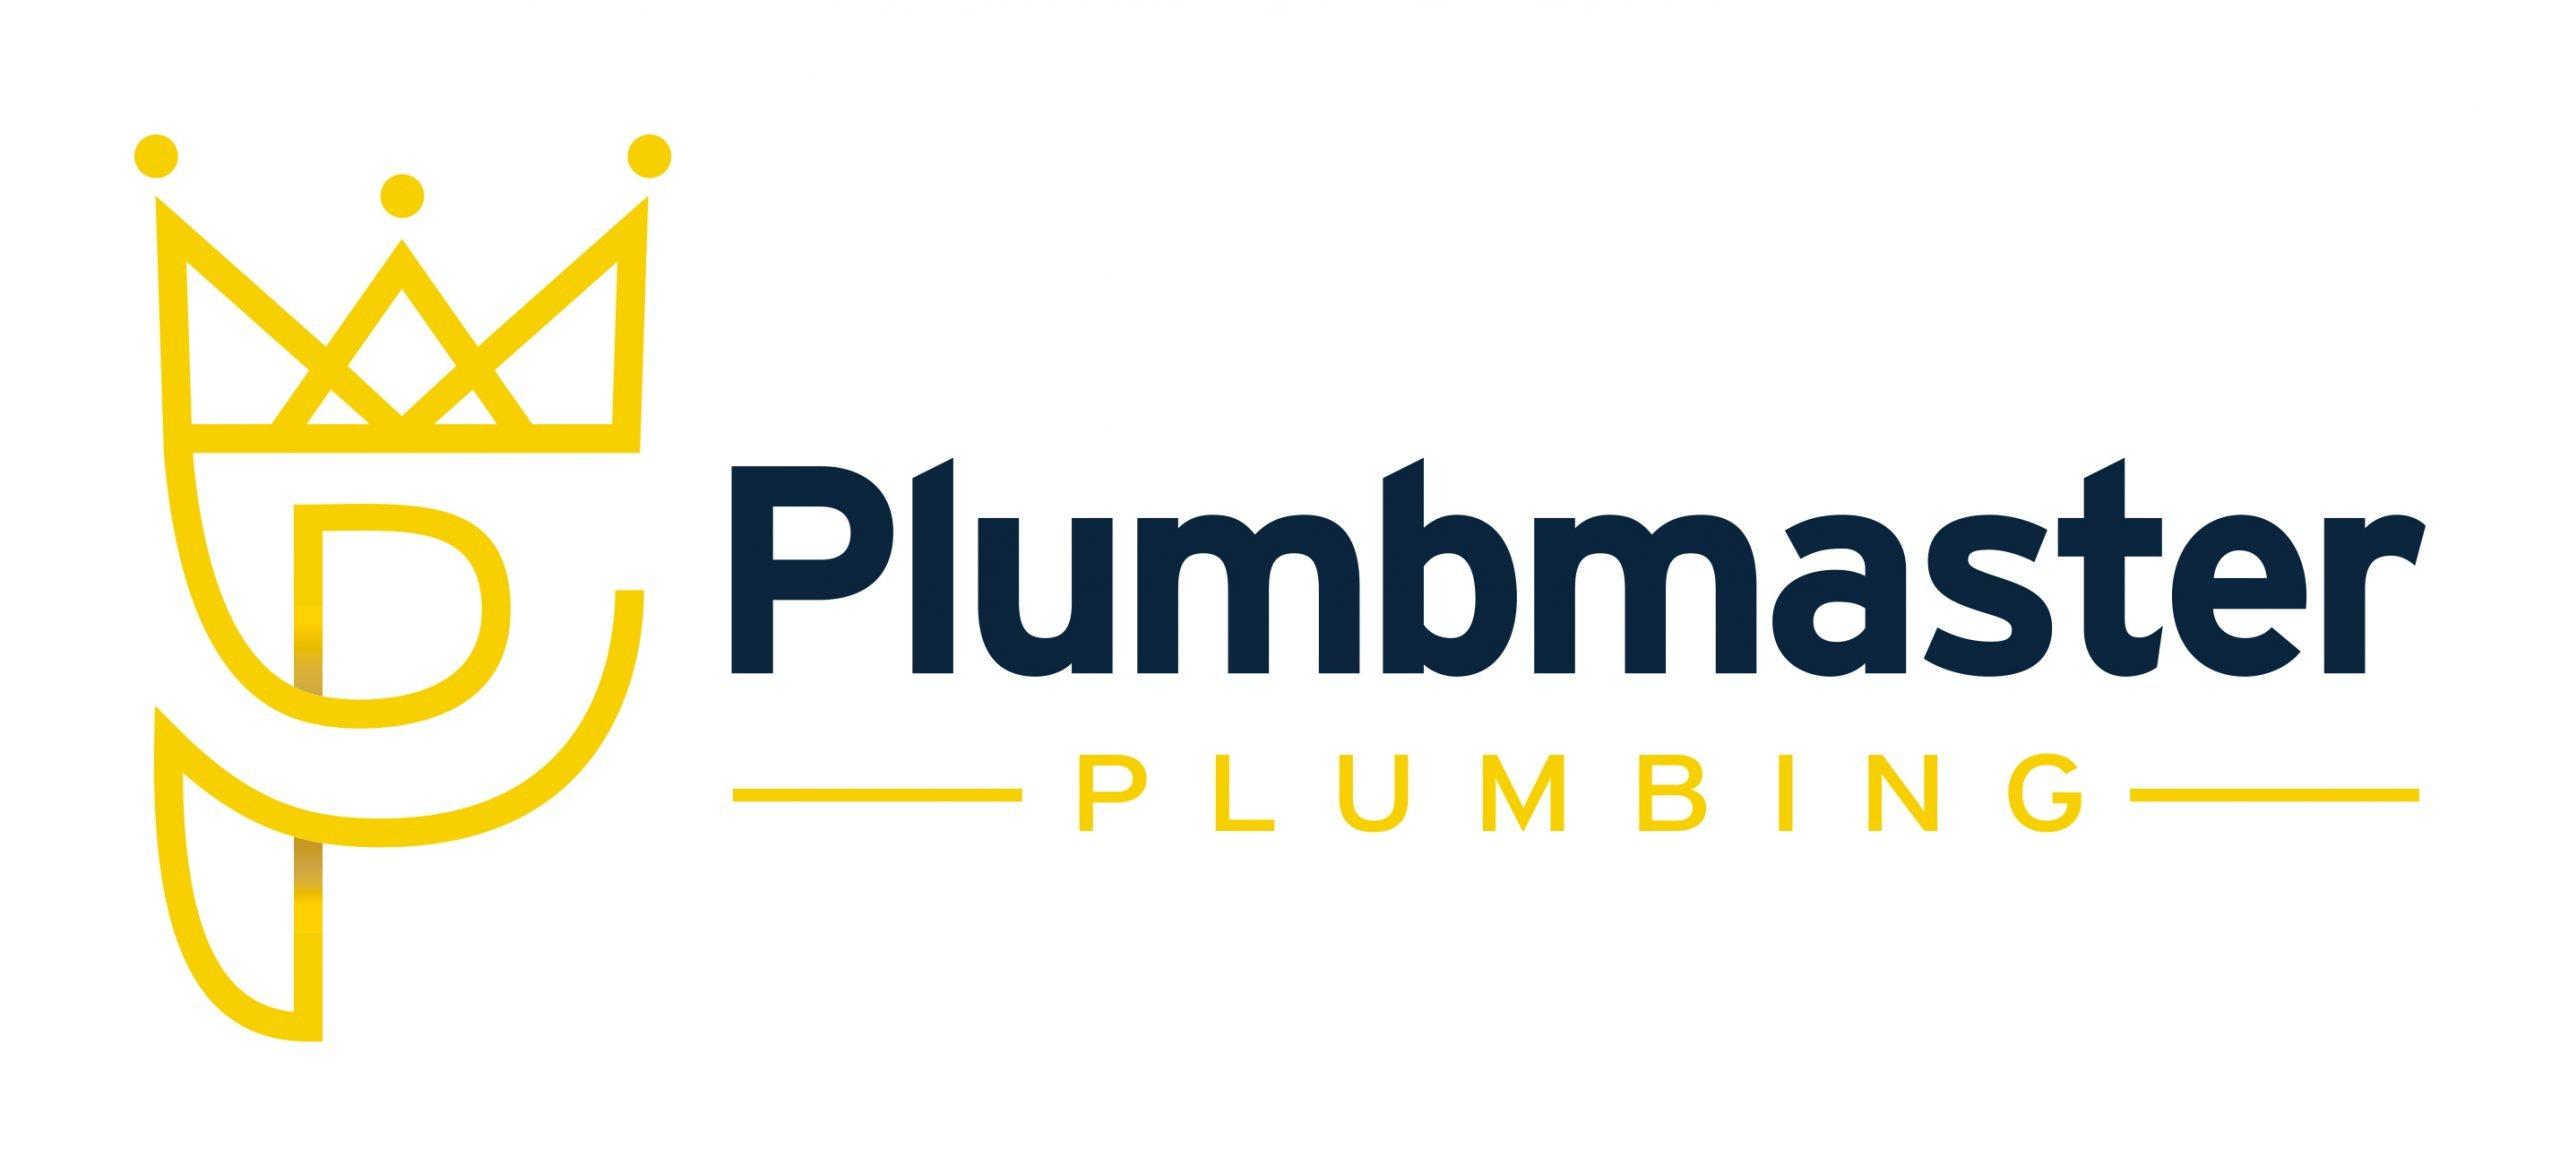 24/7 Plumber Sydney Services | Plumbmaster Plumbing